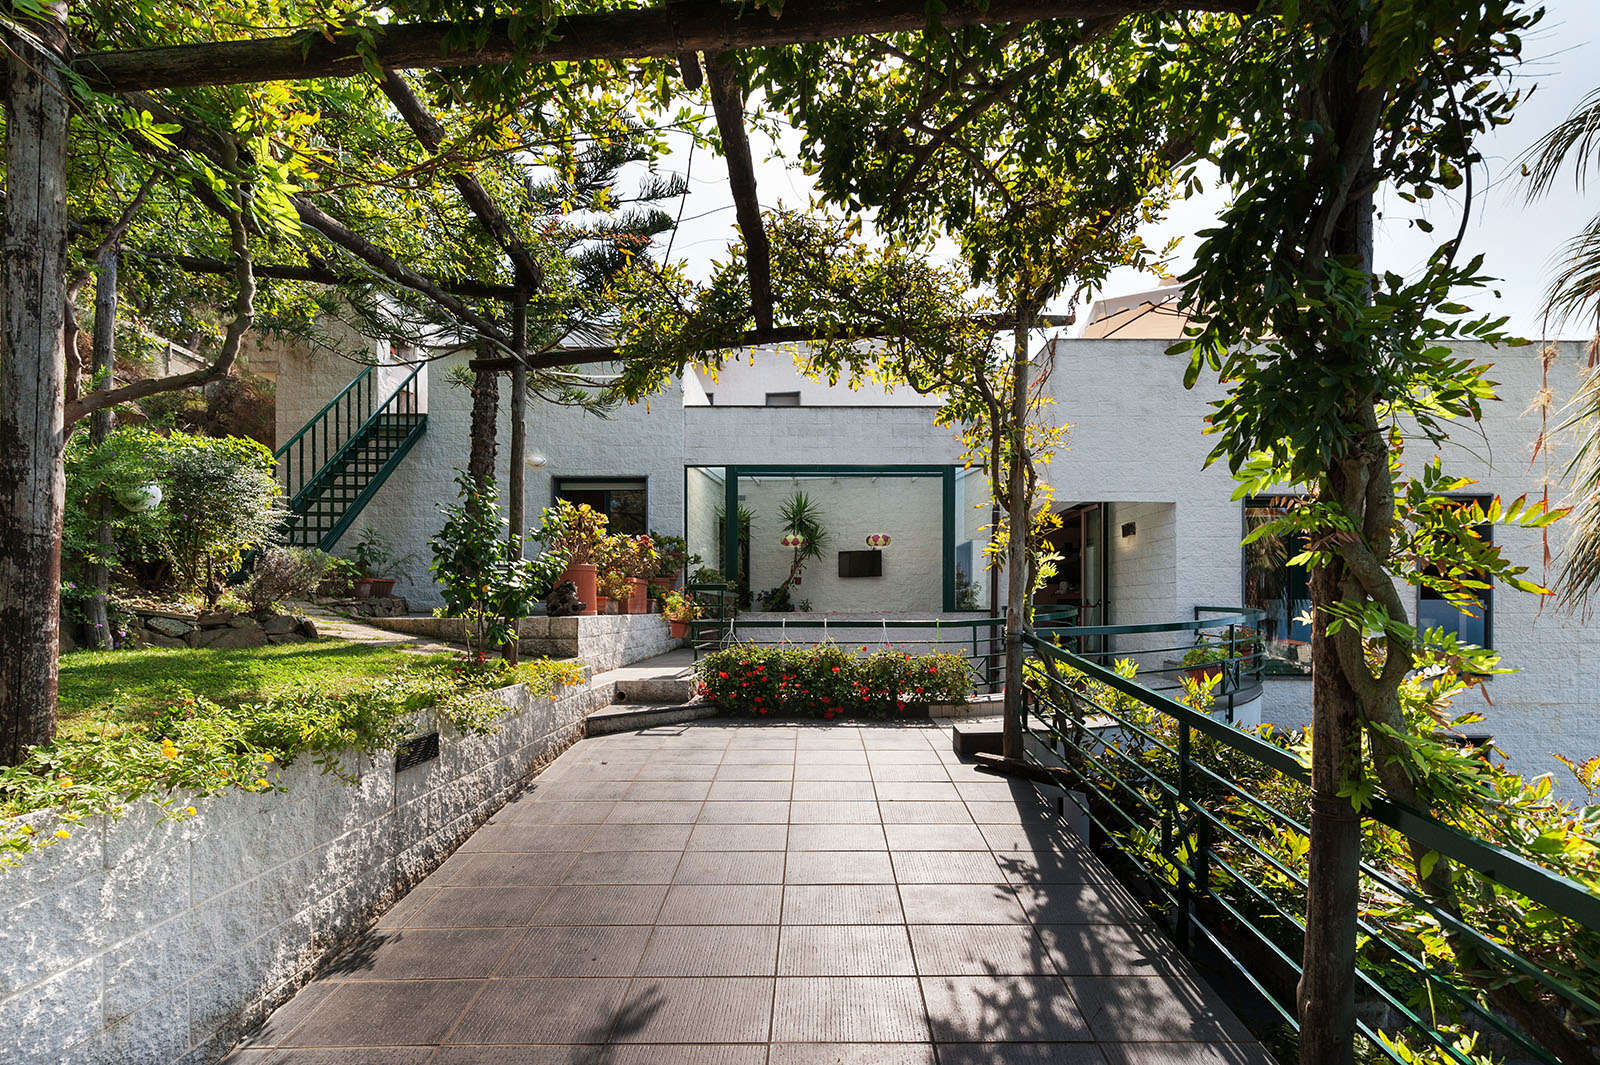 - Villa Bonsanti - Image 1/35